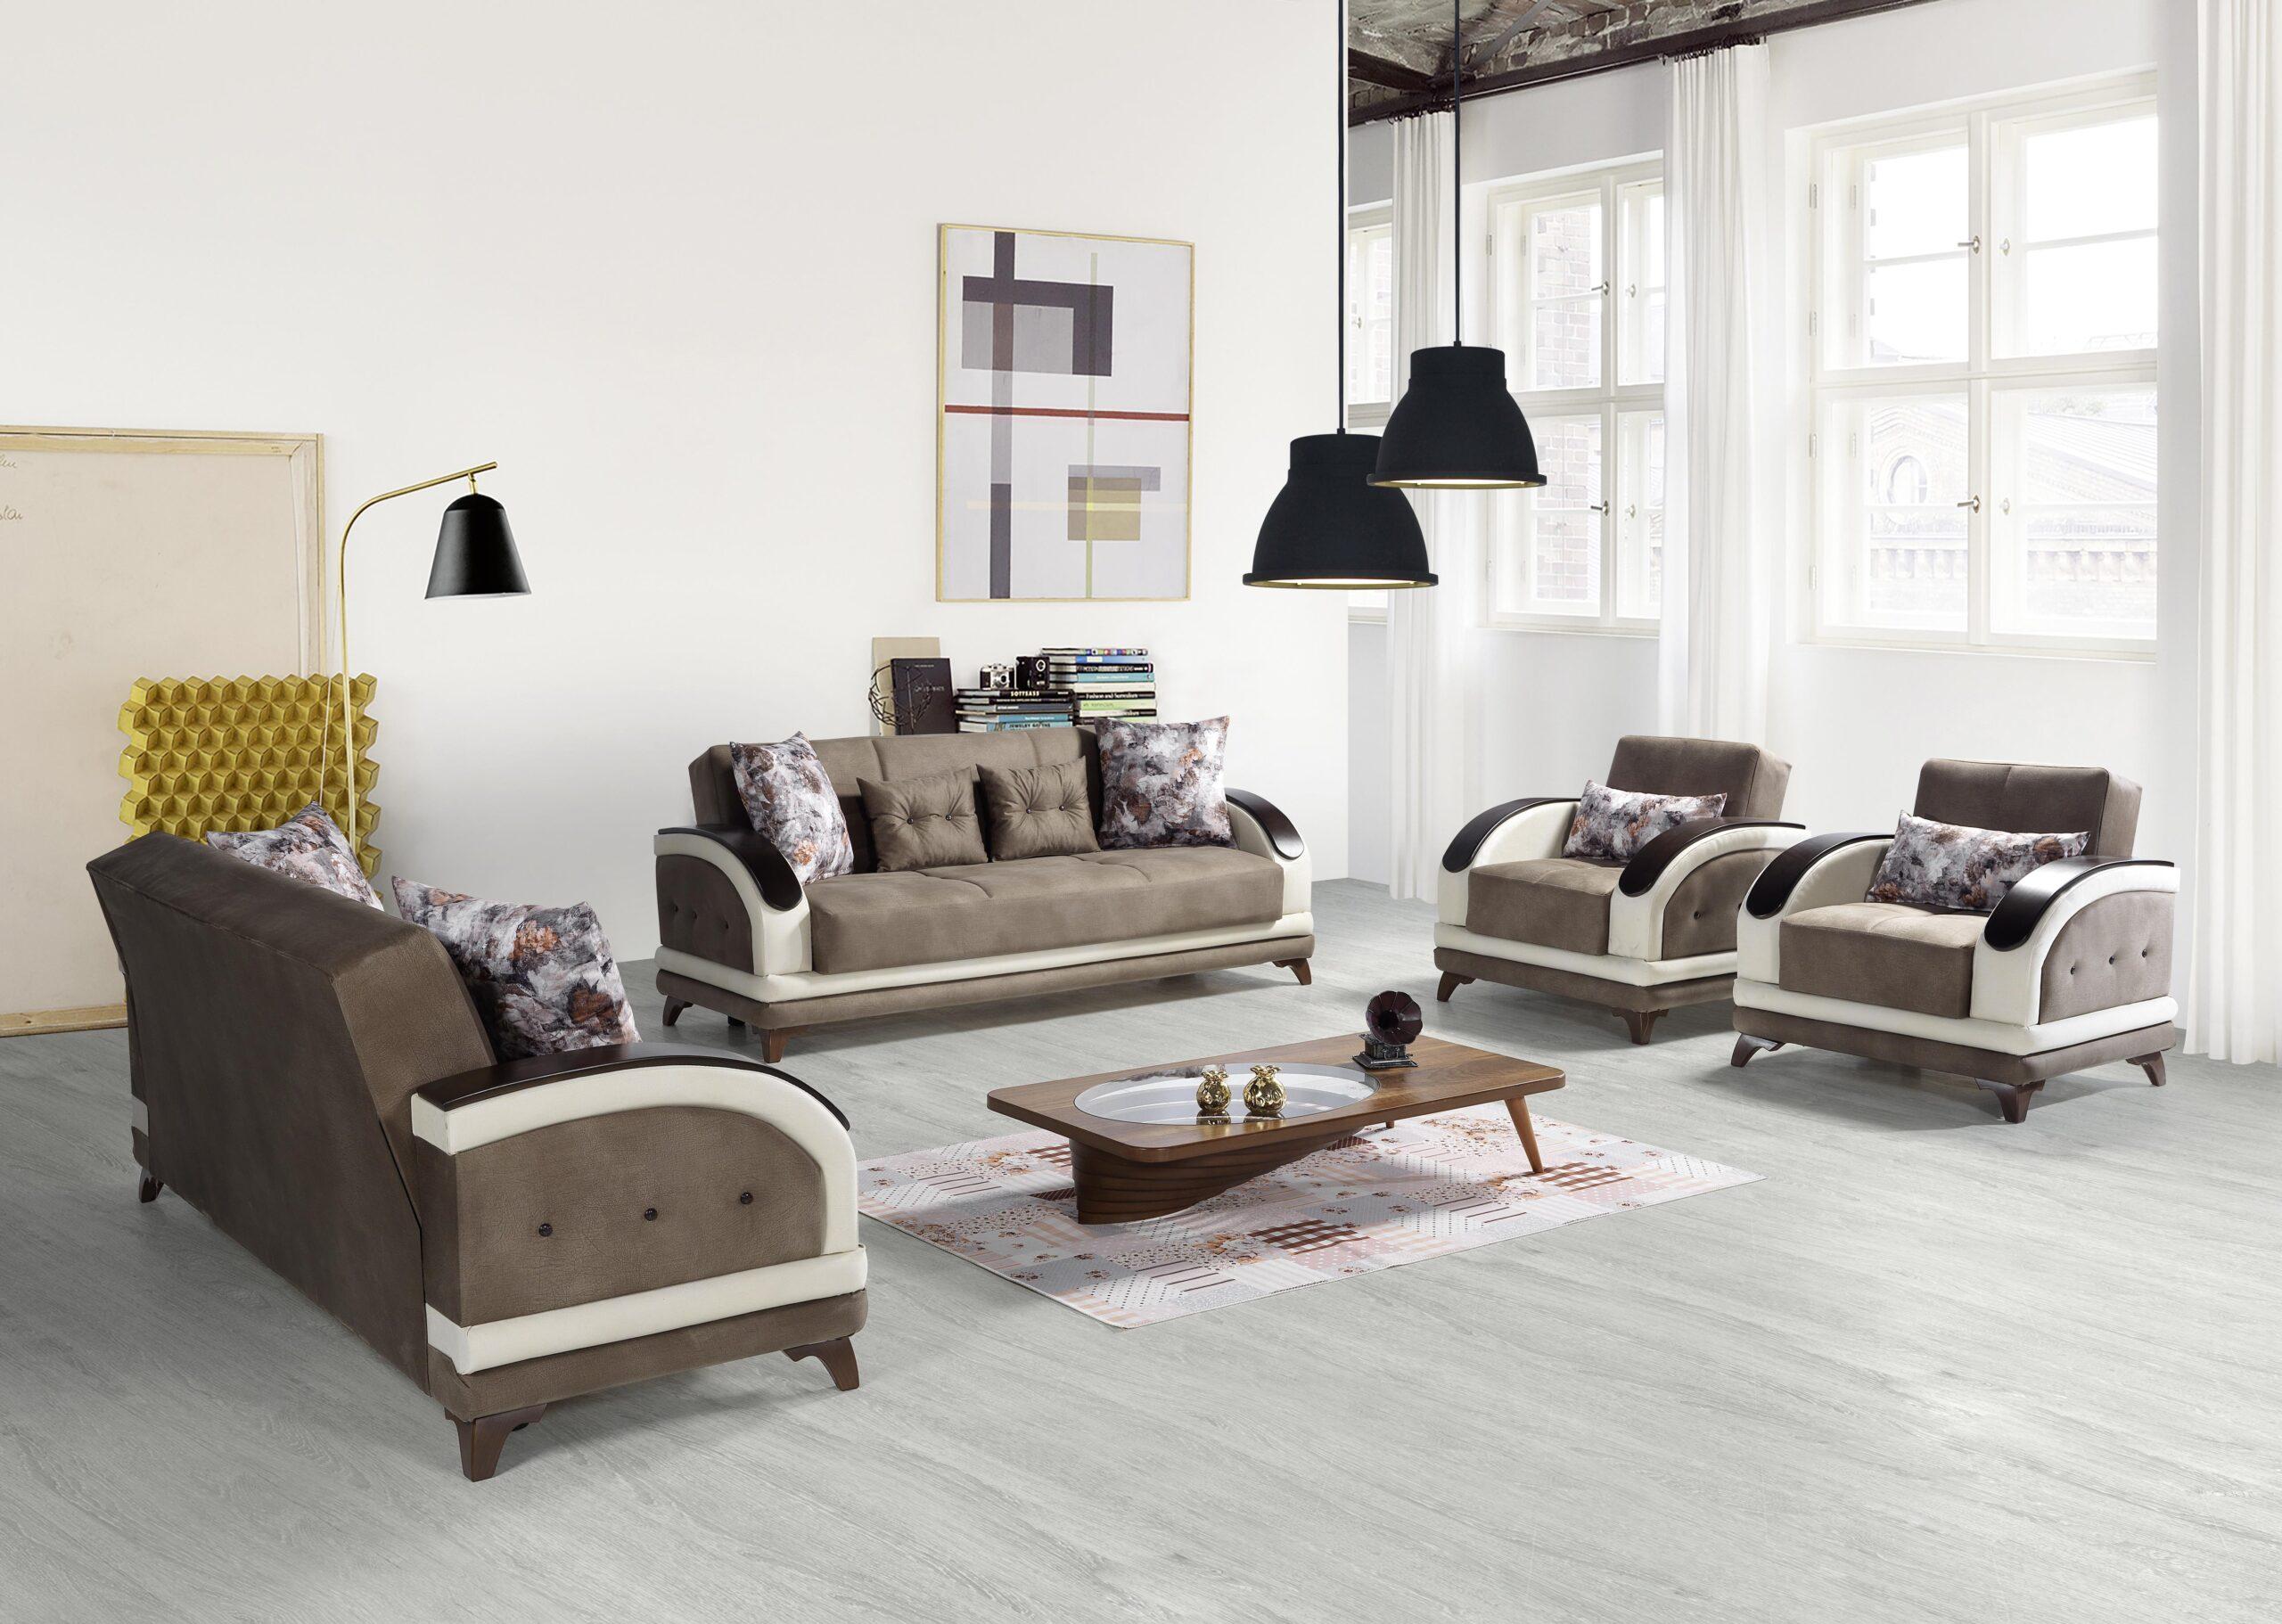 Full Size of Gnstige Couch Mit Schlaffunktion Sofa Relaxfunktion 3 Sitzer Cognac Big Hocker Rundes Canape Flexform Groß Modulares Große Kissen Leinen Günstig Günstiges Sofa Günstige Sofa